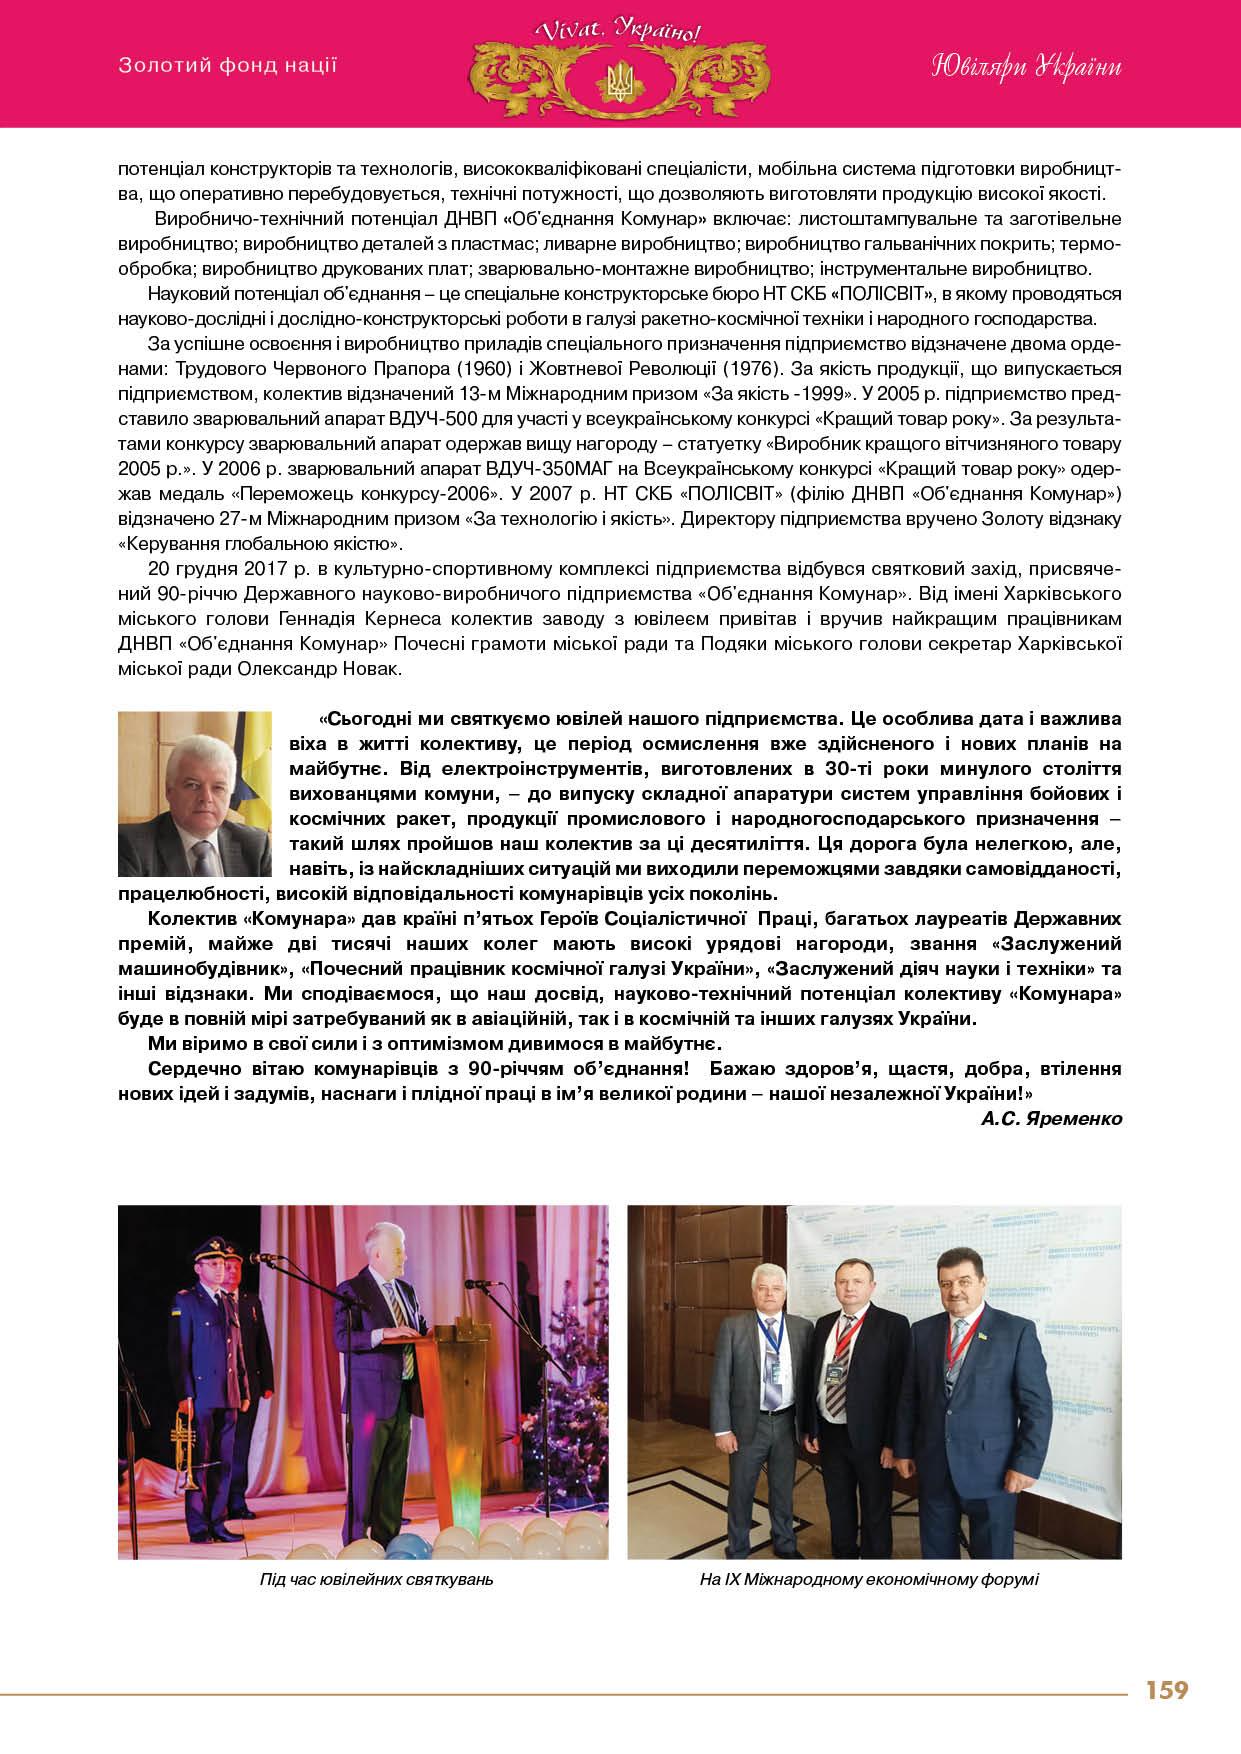 Яременко Анатолій Степанович